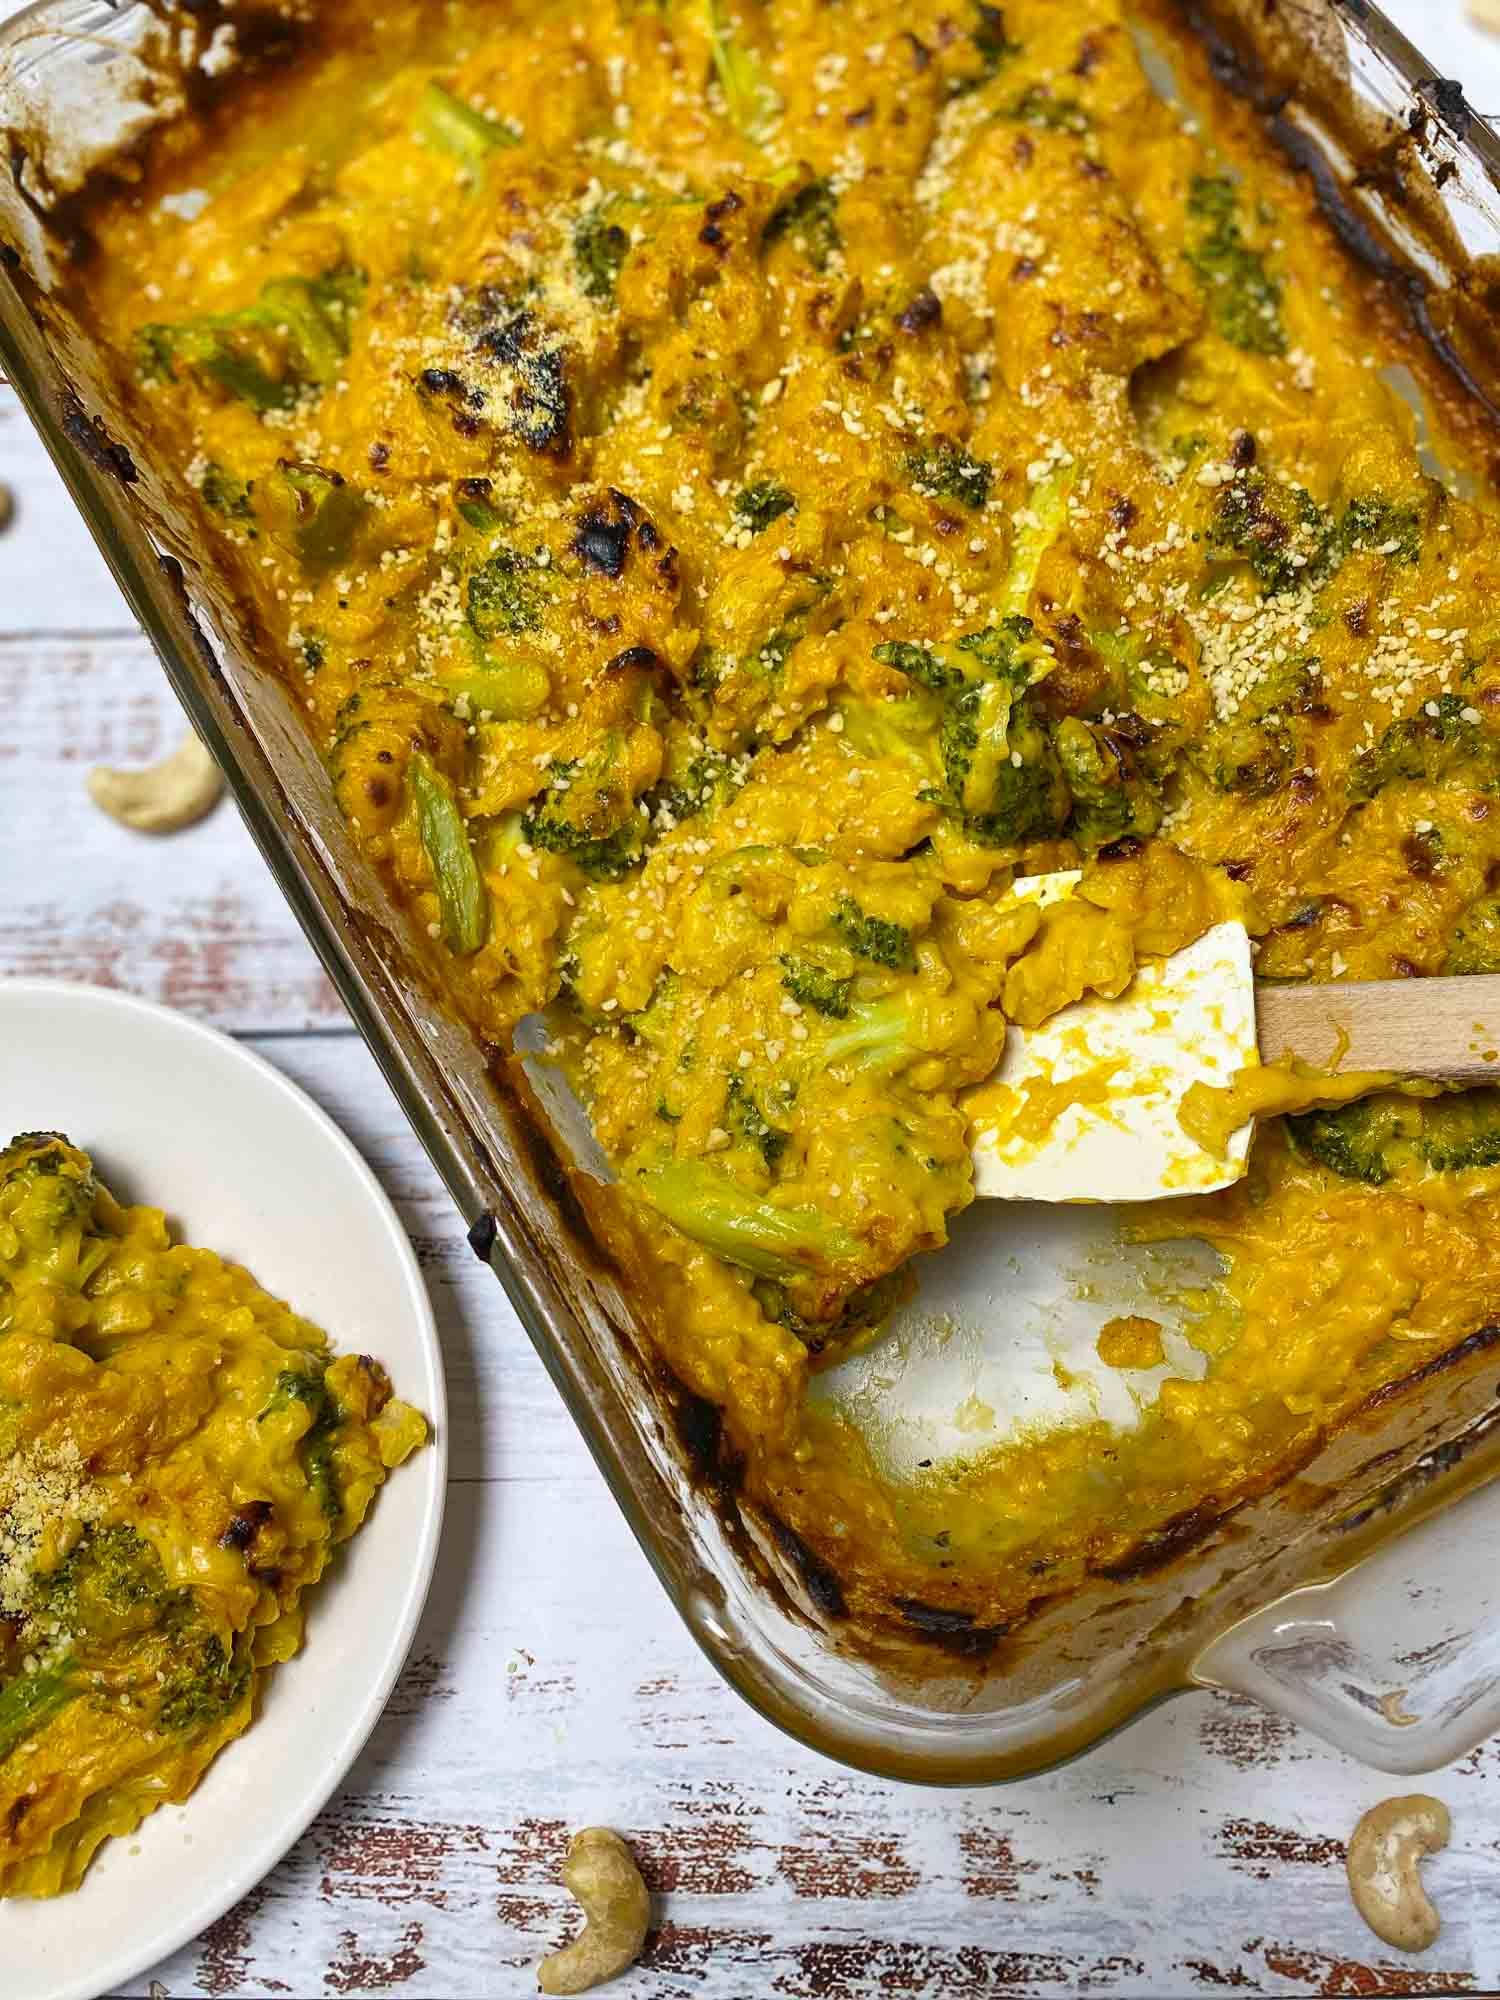 tray of broccoli rice casserole with spatula inside